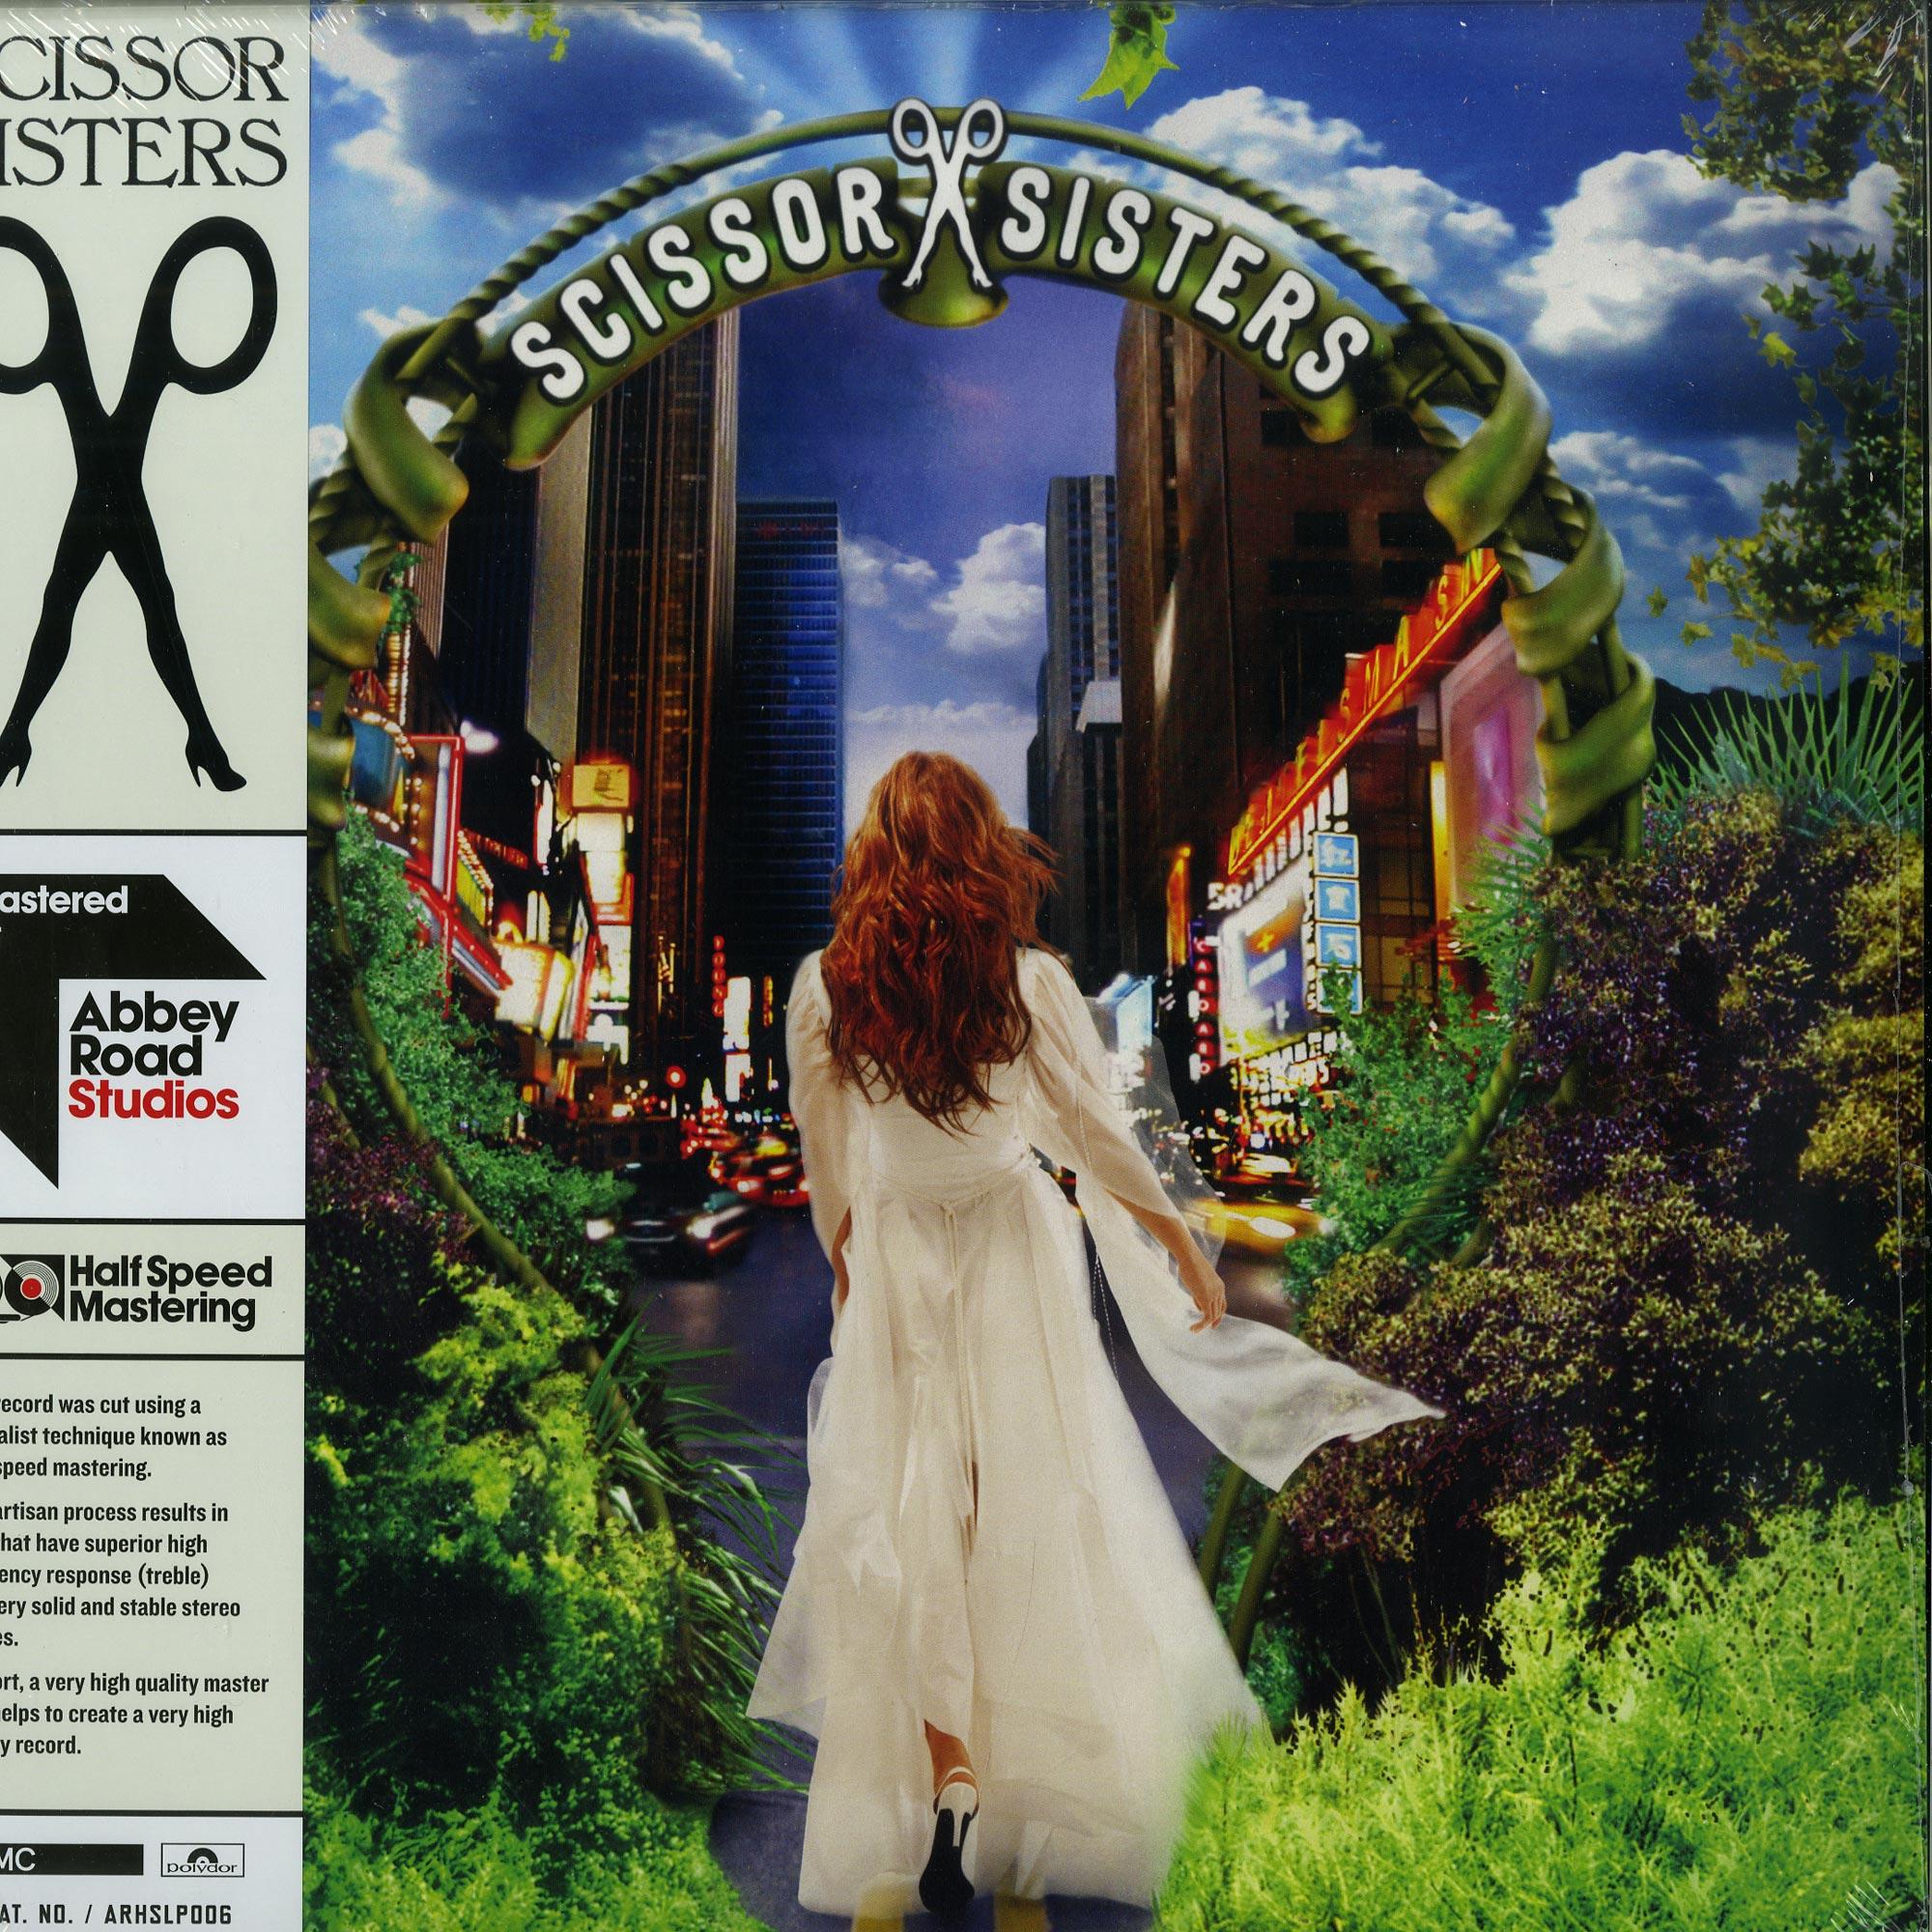 Scissor Sisters - SCISSOR SISTERS